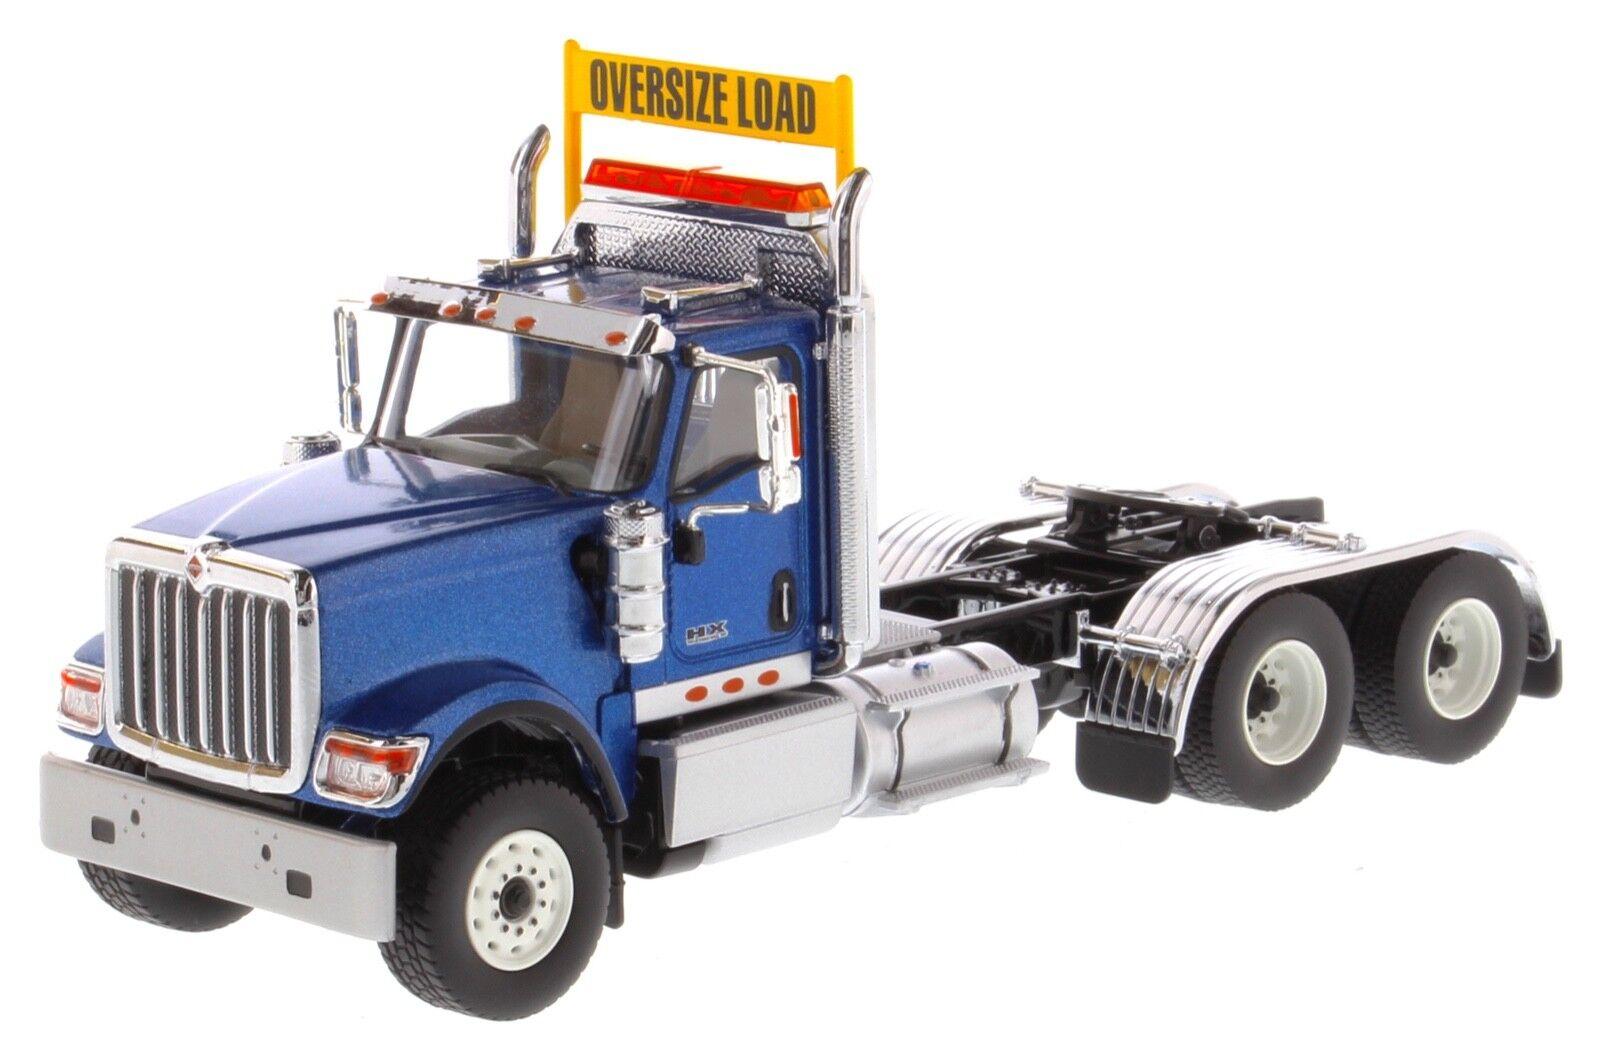 International 1 50 escala HX520 blu tándem Tractor-Diecast Masters 71004